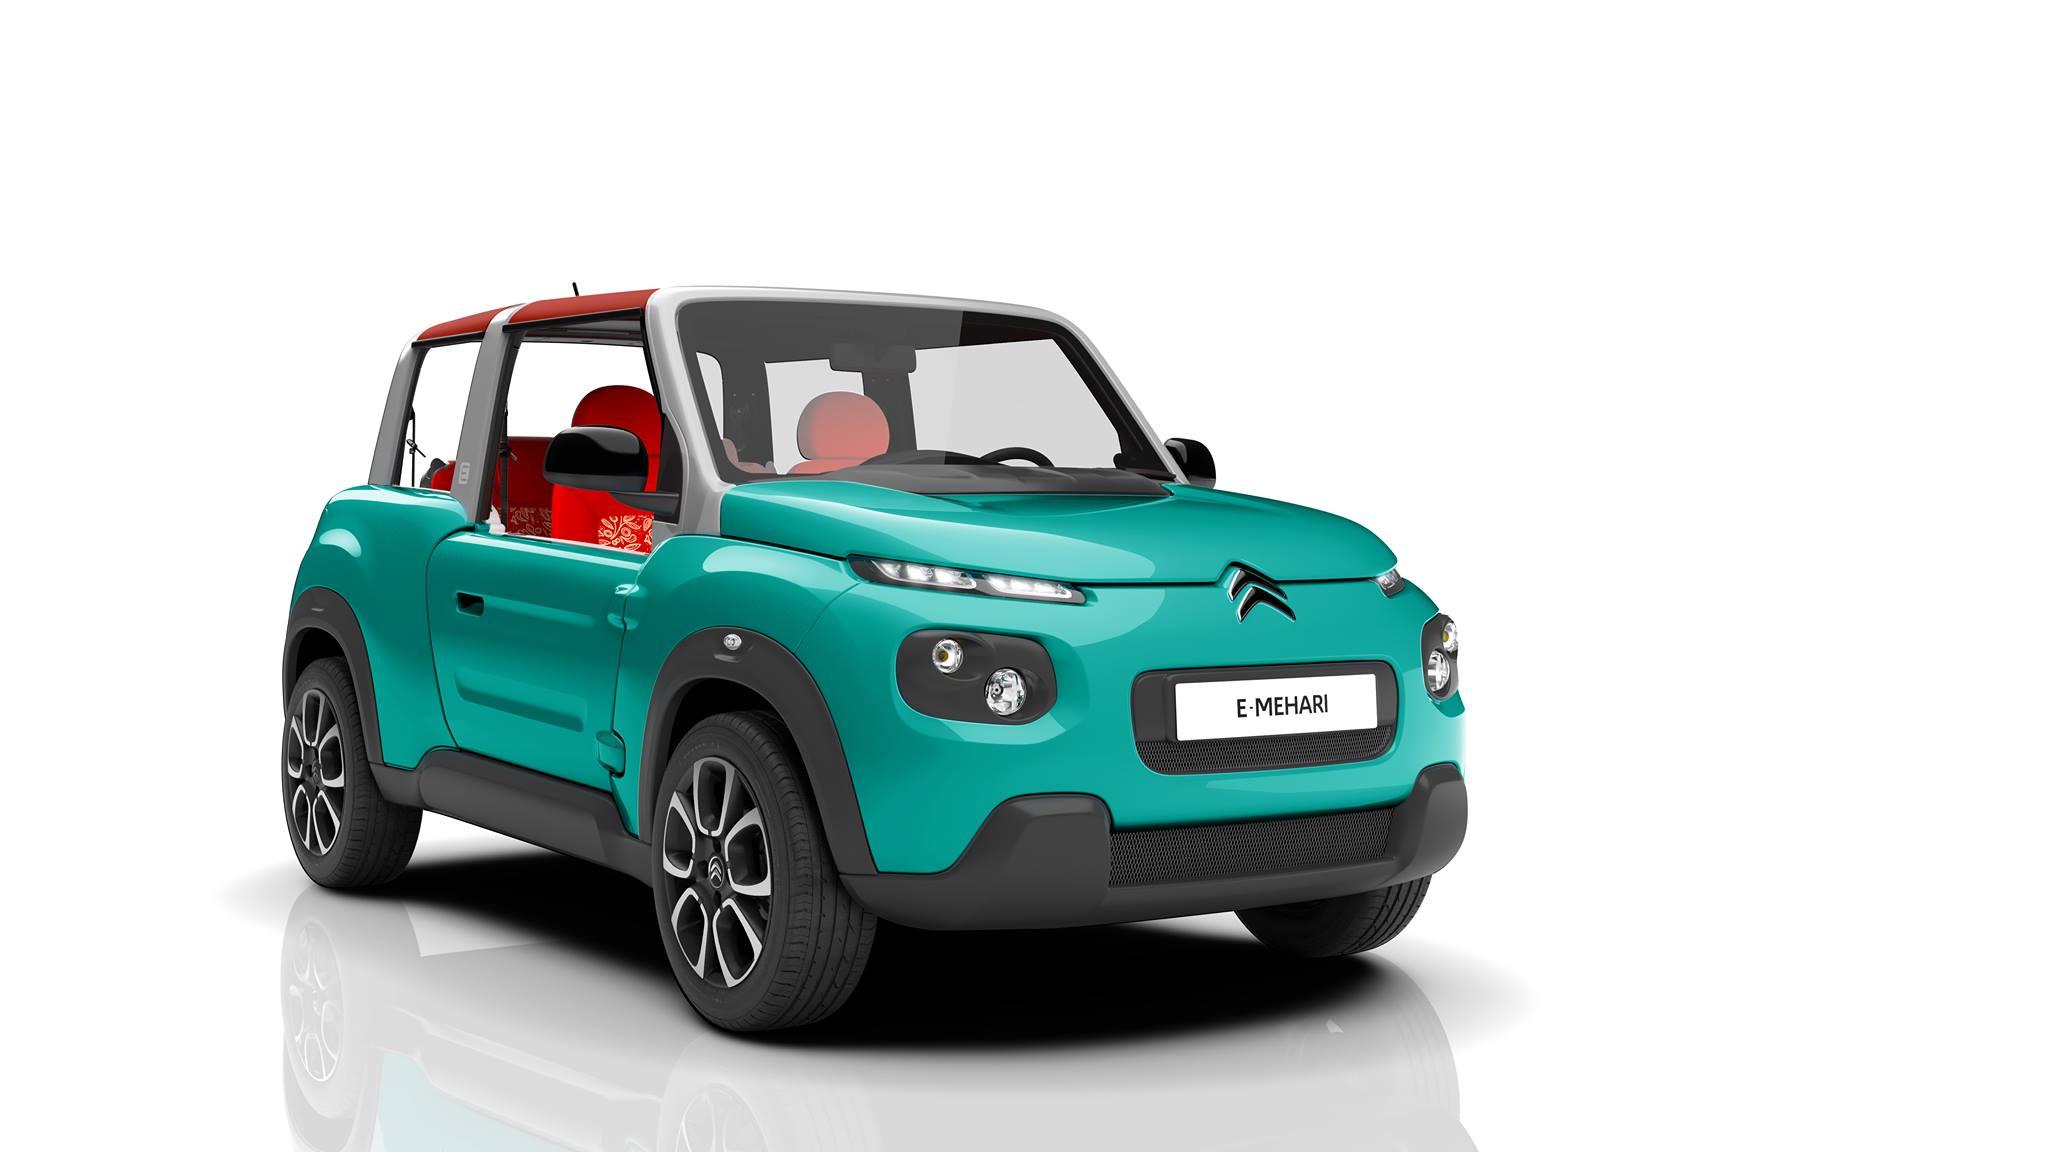 Citroën E-MEHARI - 2016 - profil avant / front side-face